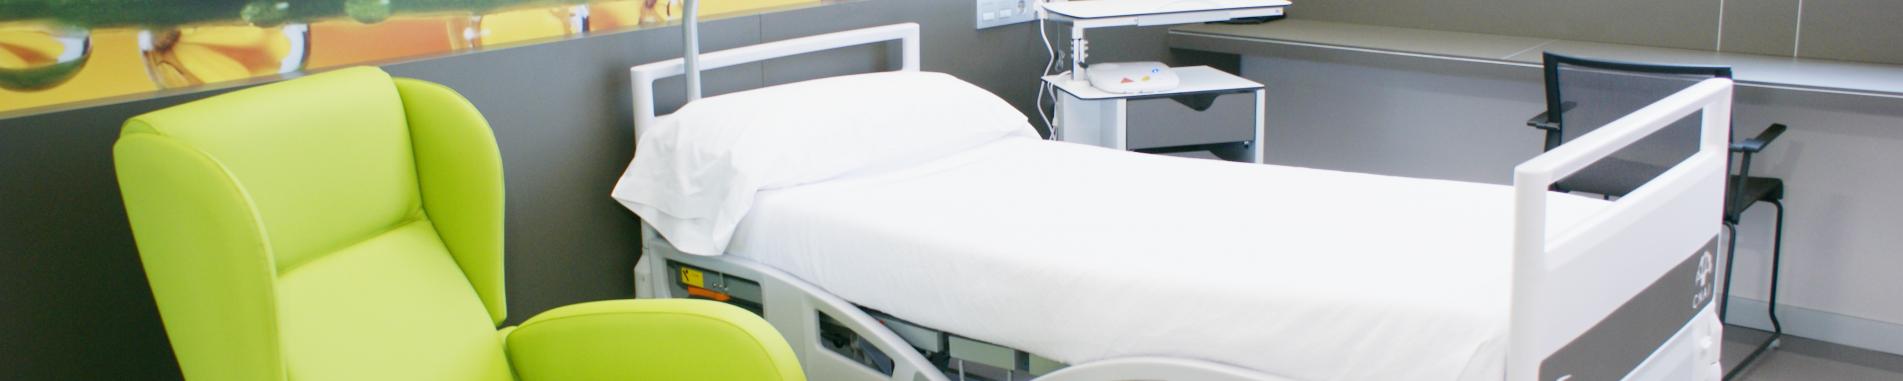 Hospital-cnai-pamplona